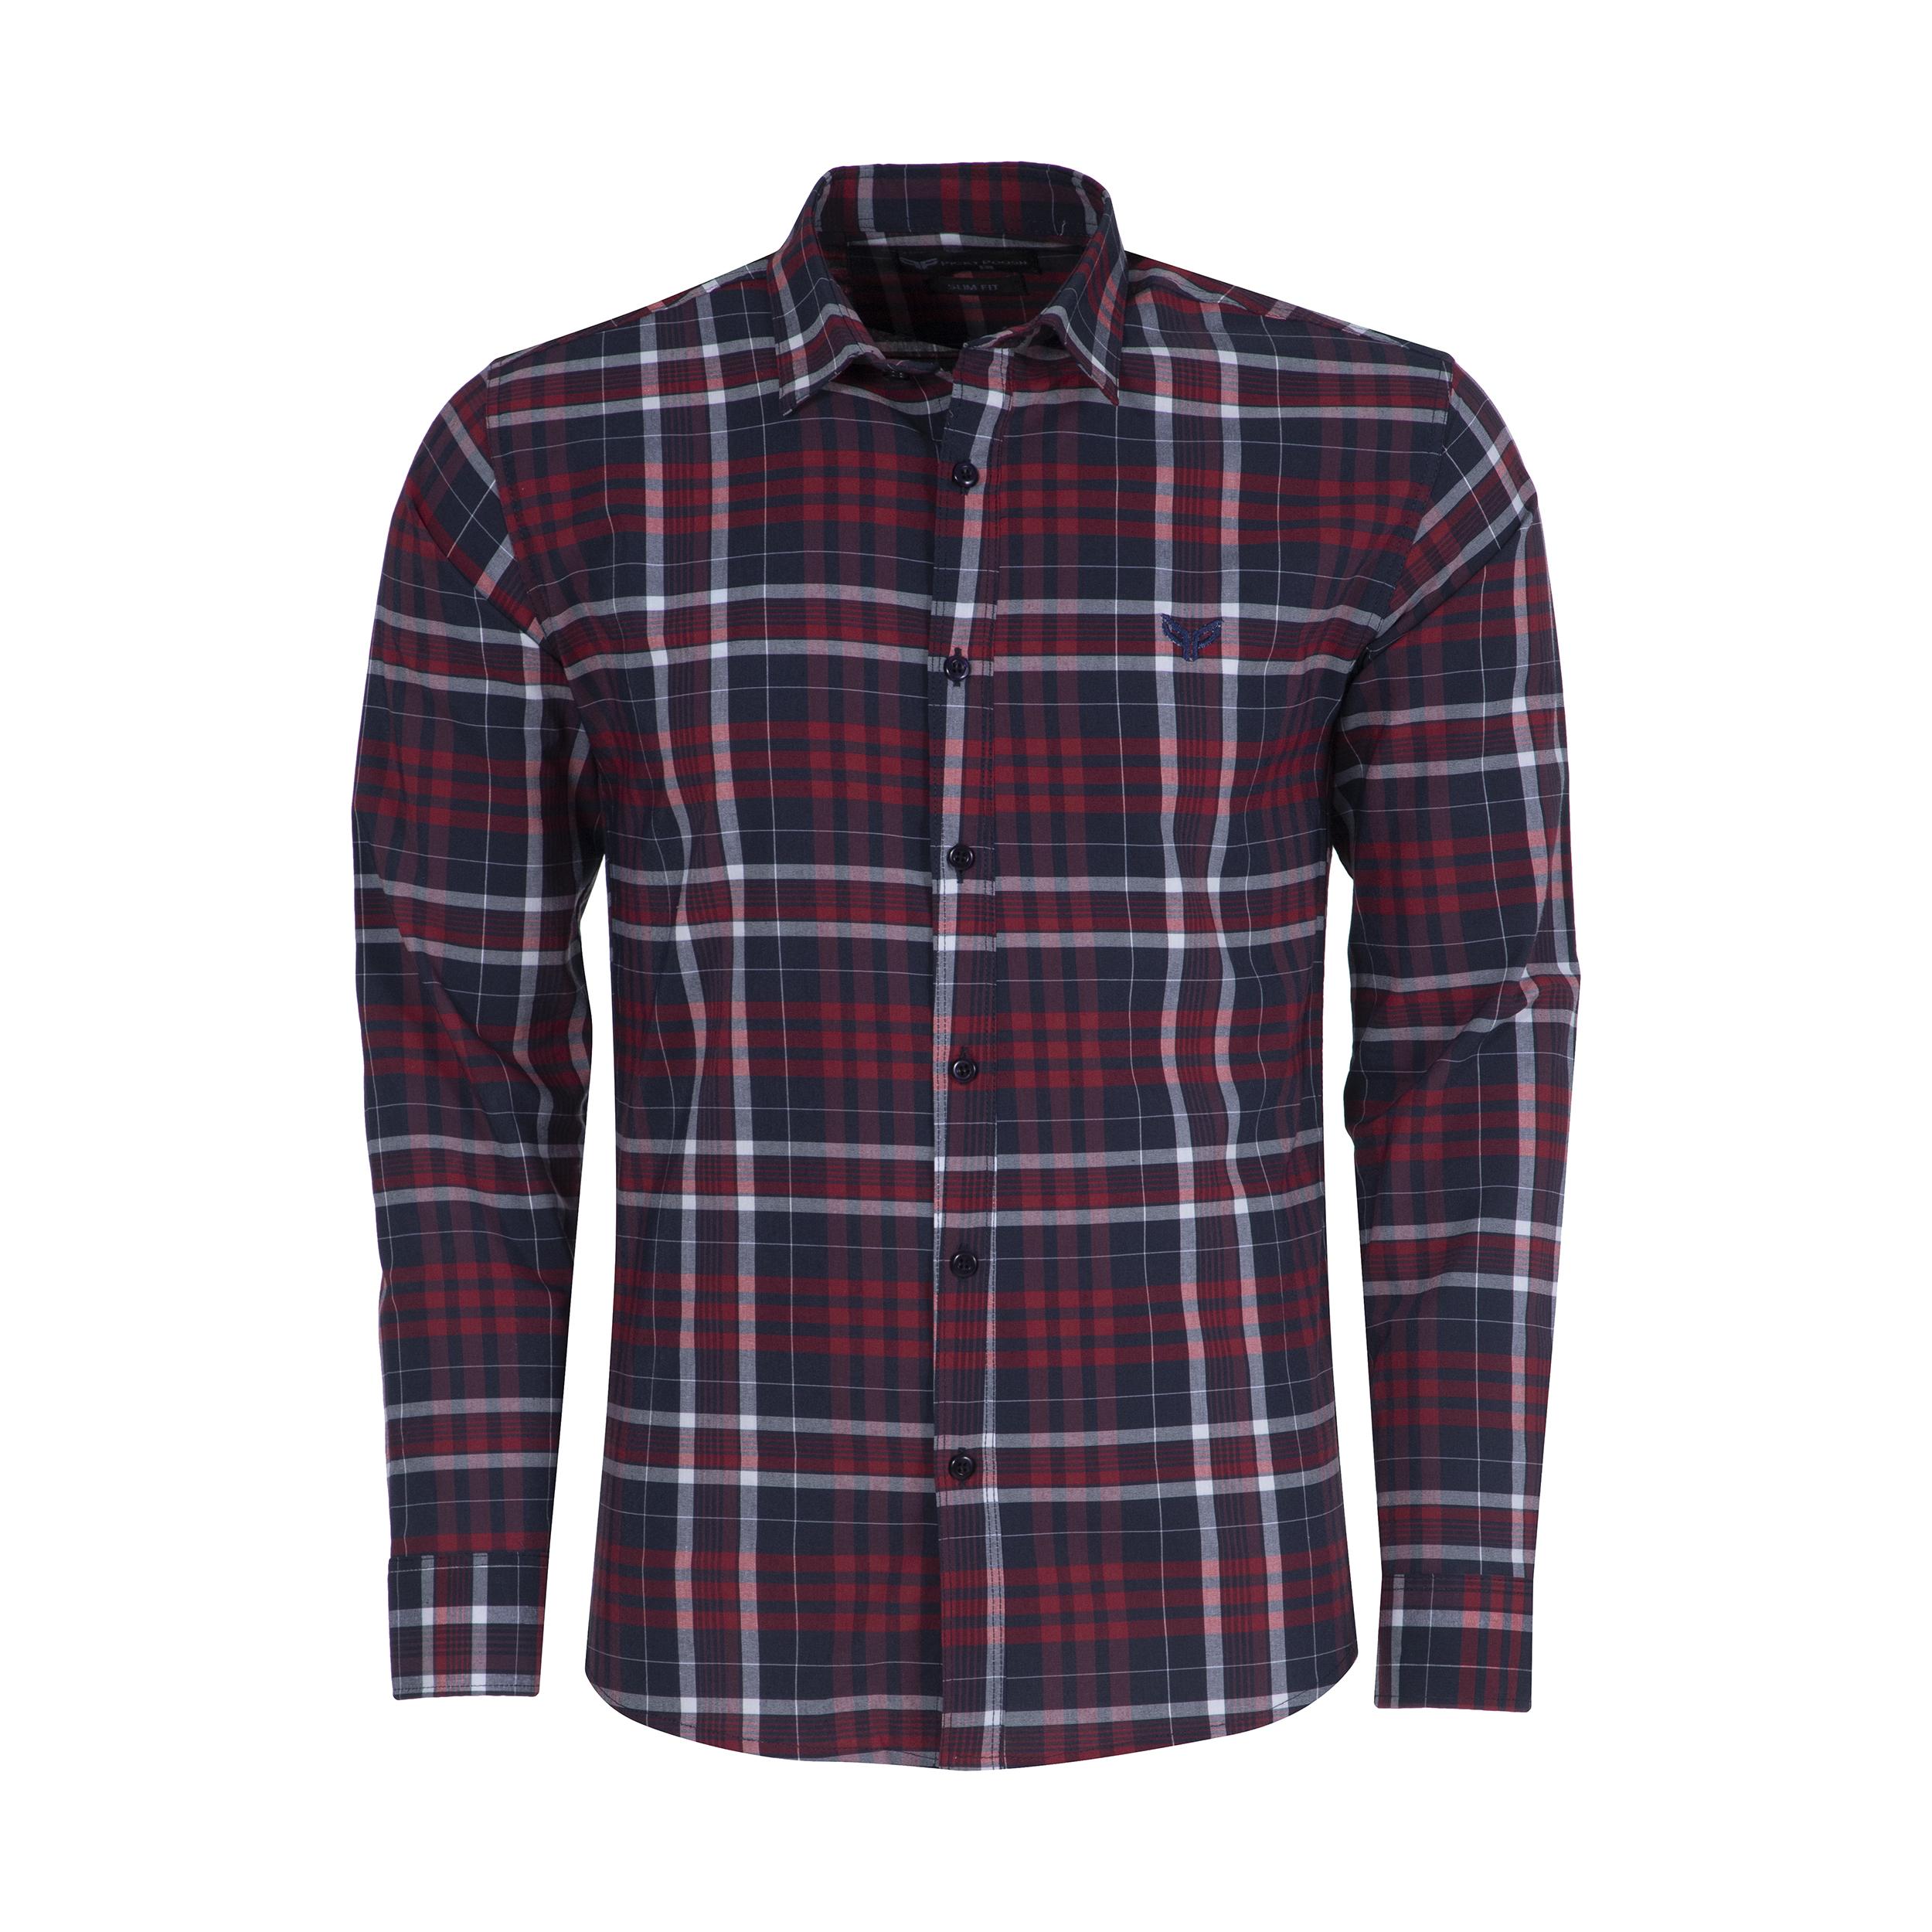 پیراهن مردانه کد M02321